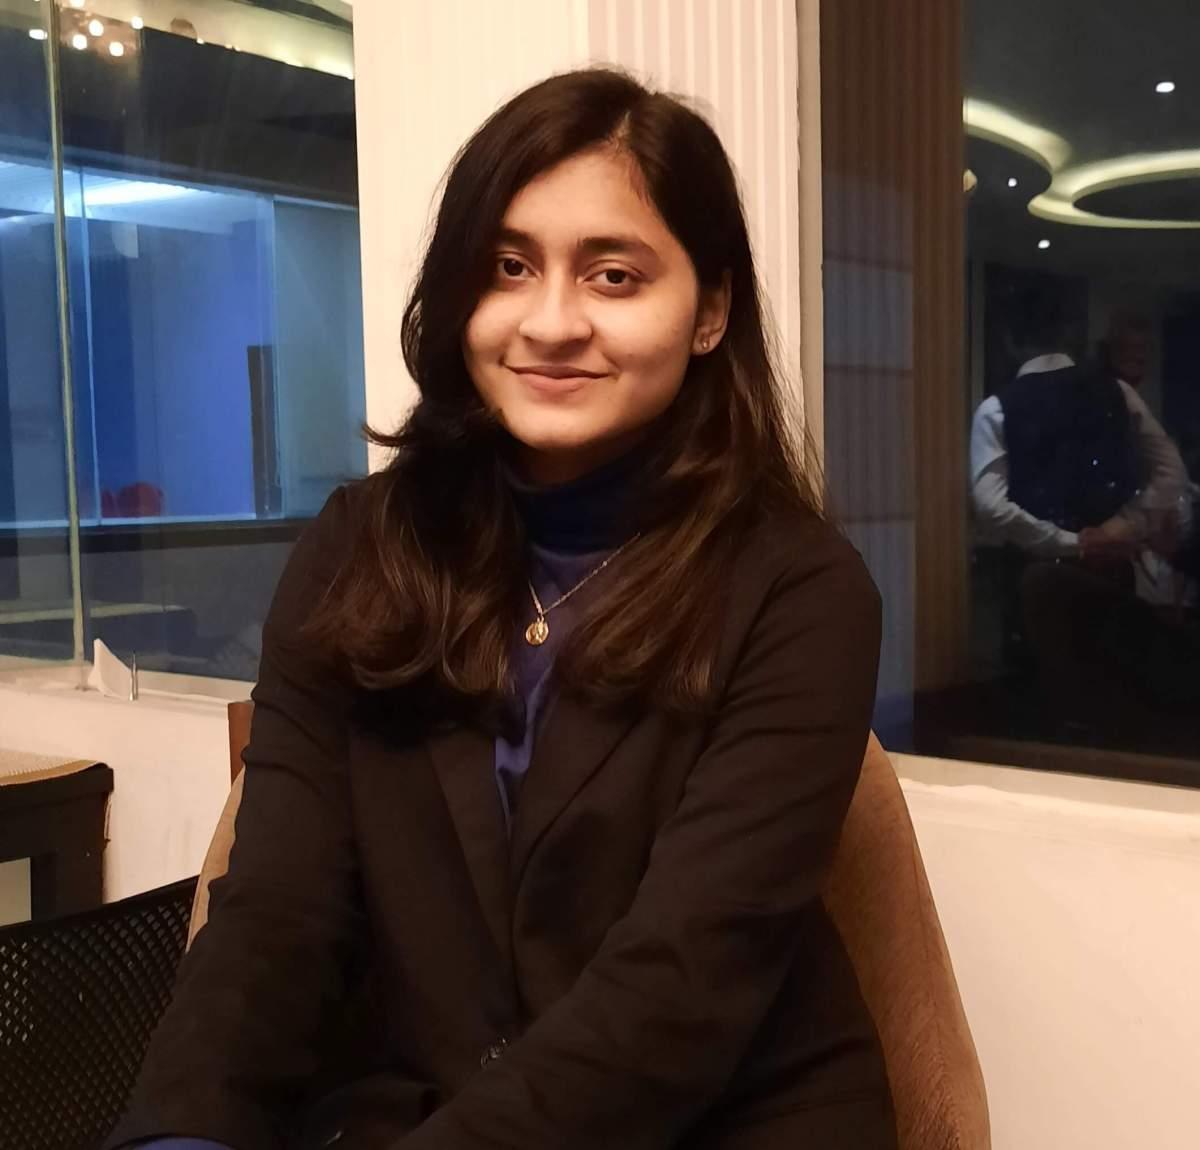 image of Tasfia Azrin Faiza